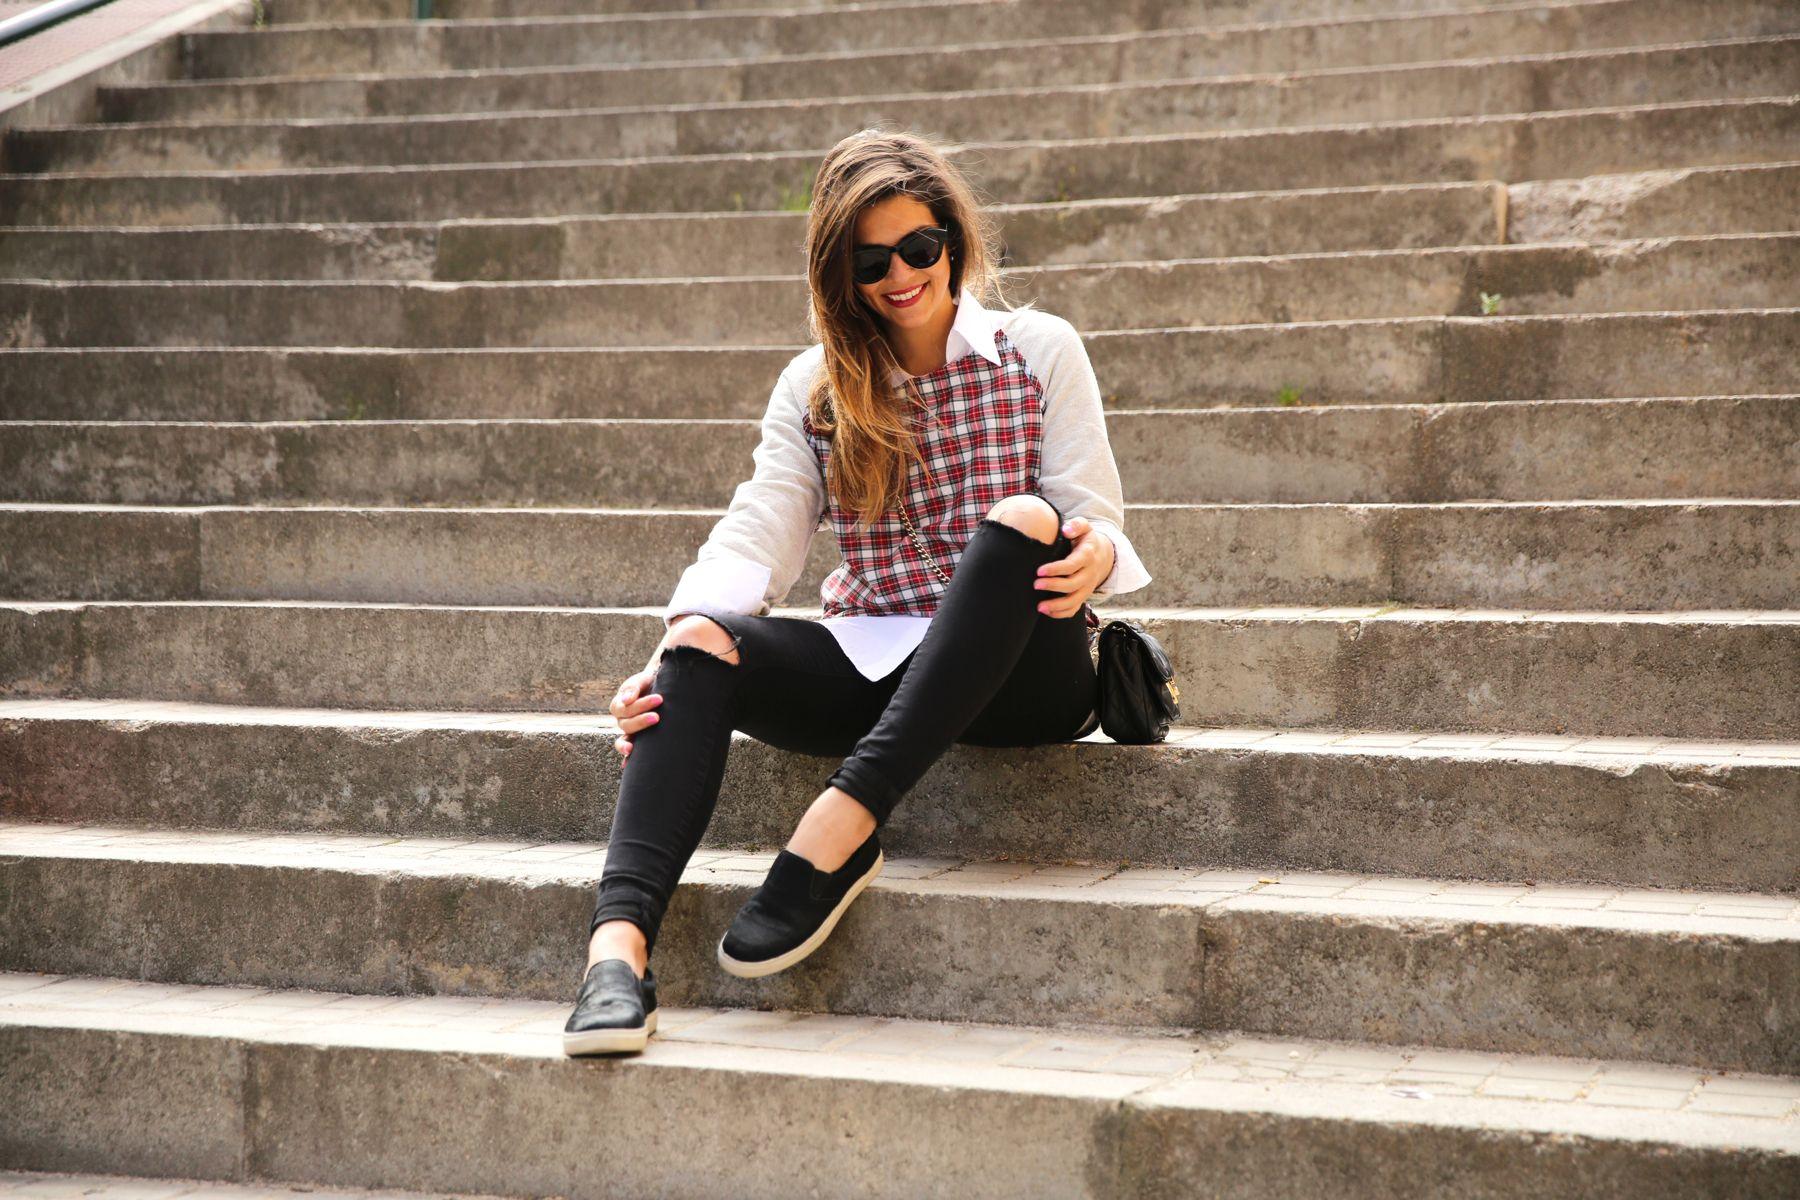 trendy_taste-look-outfit-street_style-ootd-blog-blogger-fashion-spain-moda-españa-steve-madden-plaid-shirt-camisa-cuadros-skinny-jeans-pitillos-negros